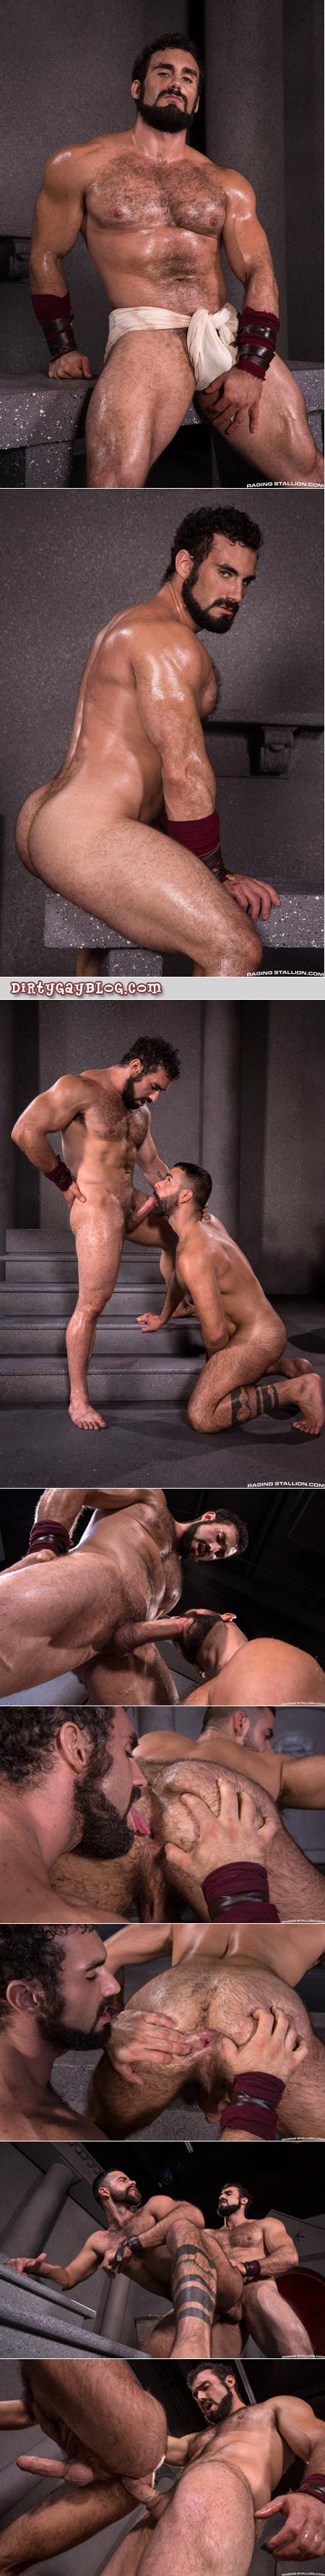 Hairy muscle hunks nude having gay sex.